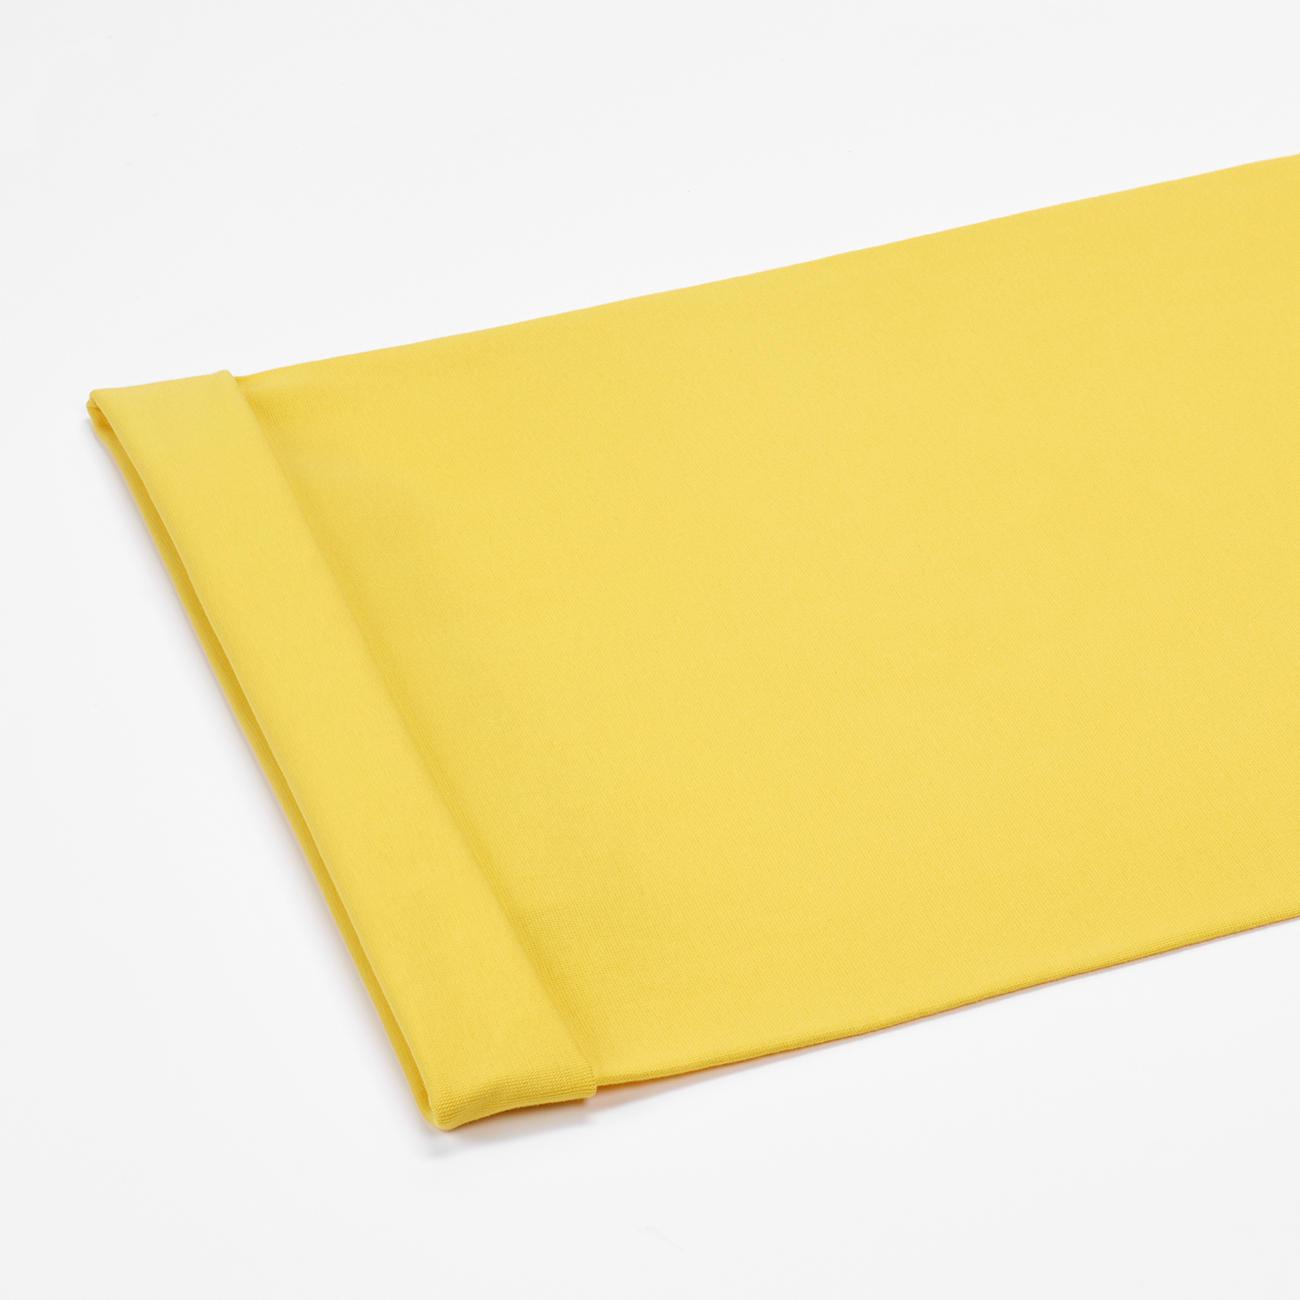 Meterware b ndchenstoff gelb Markisenstoff meterware schweiz